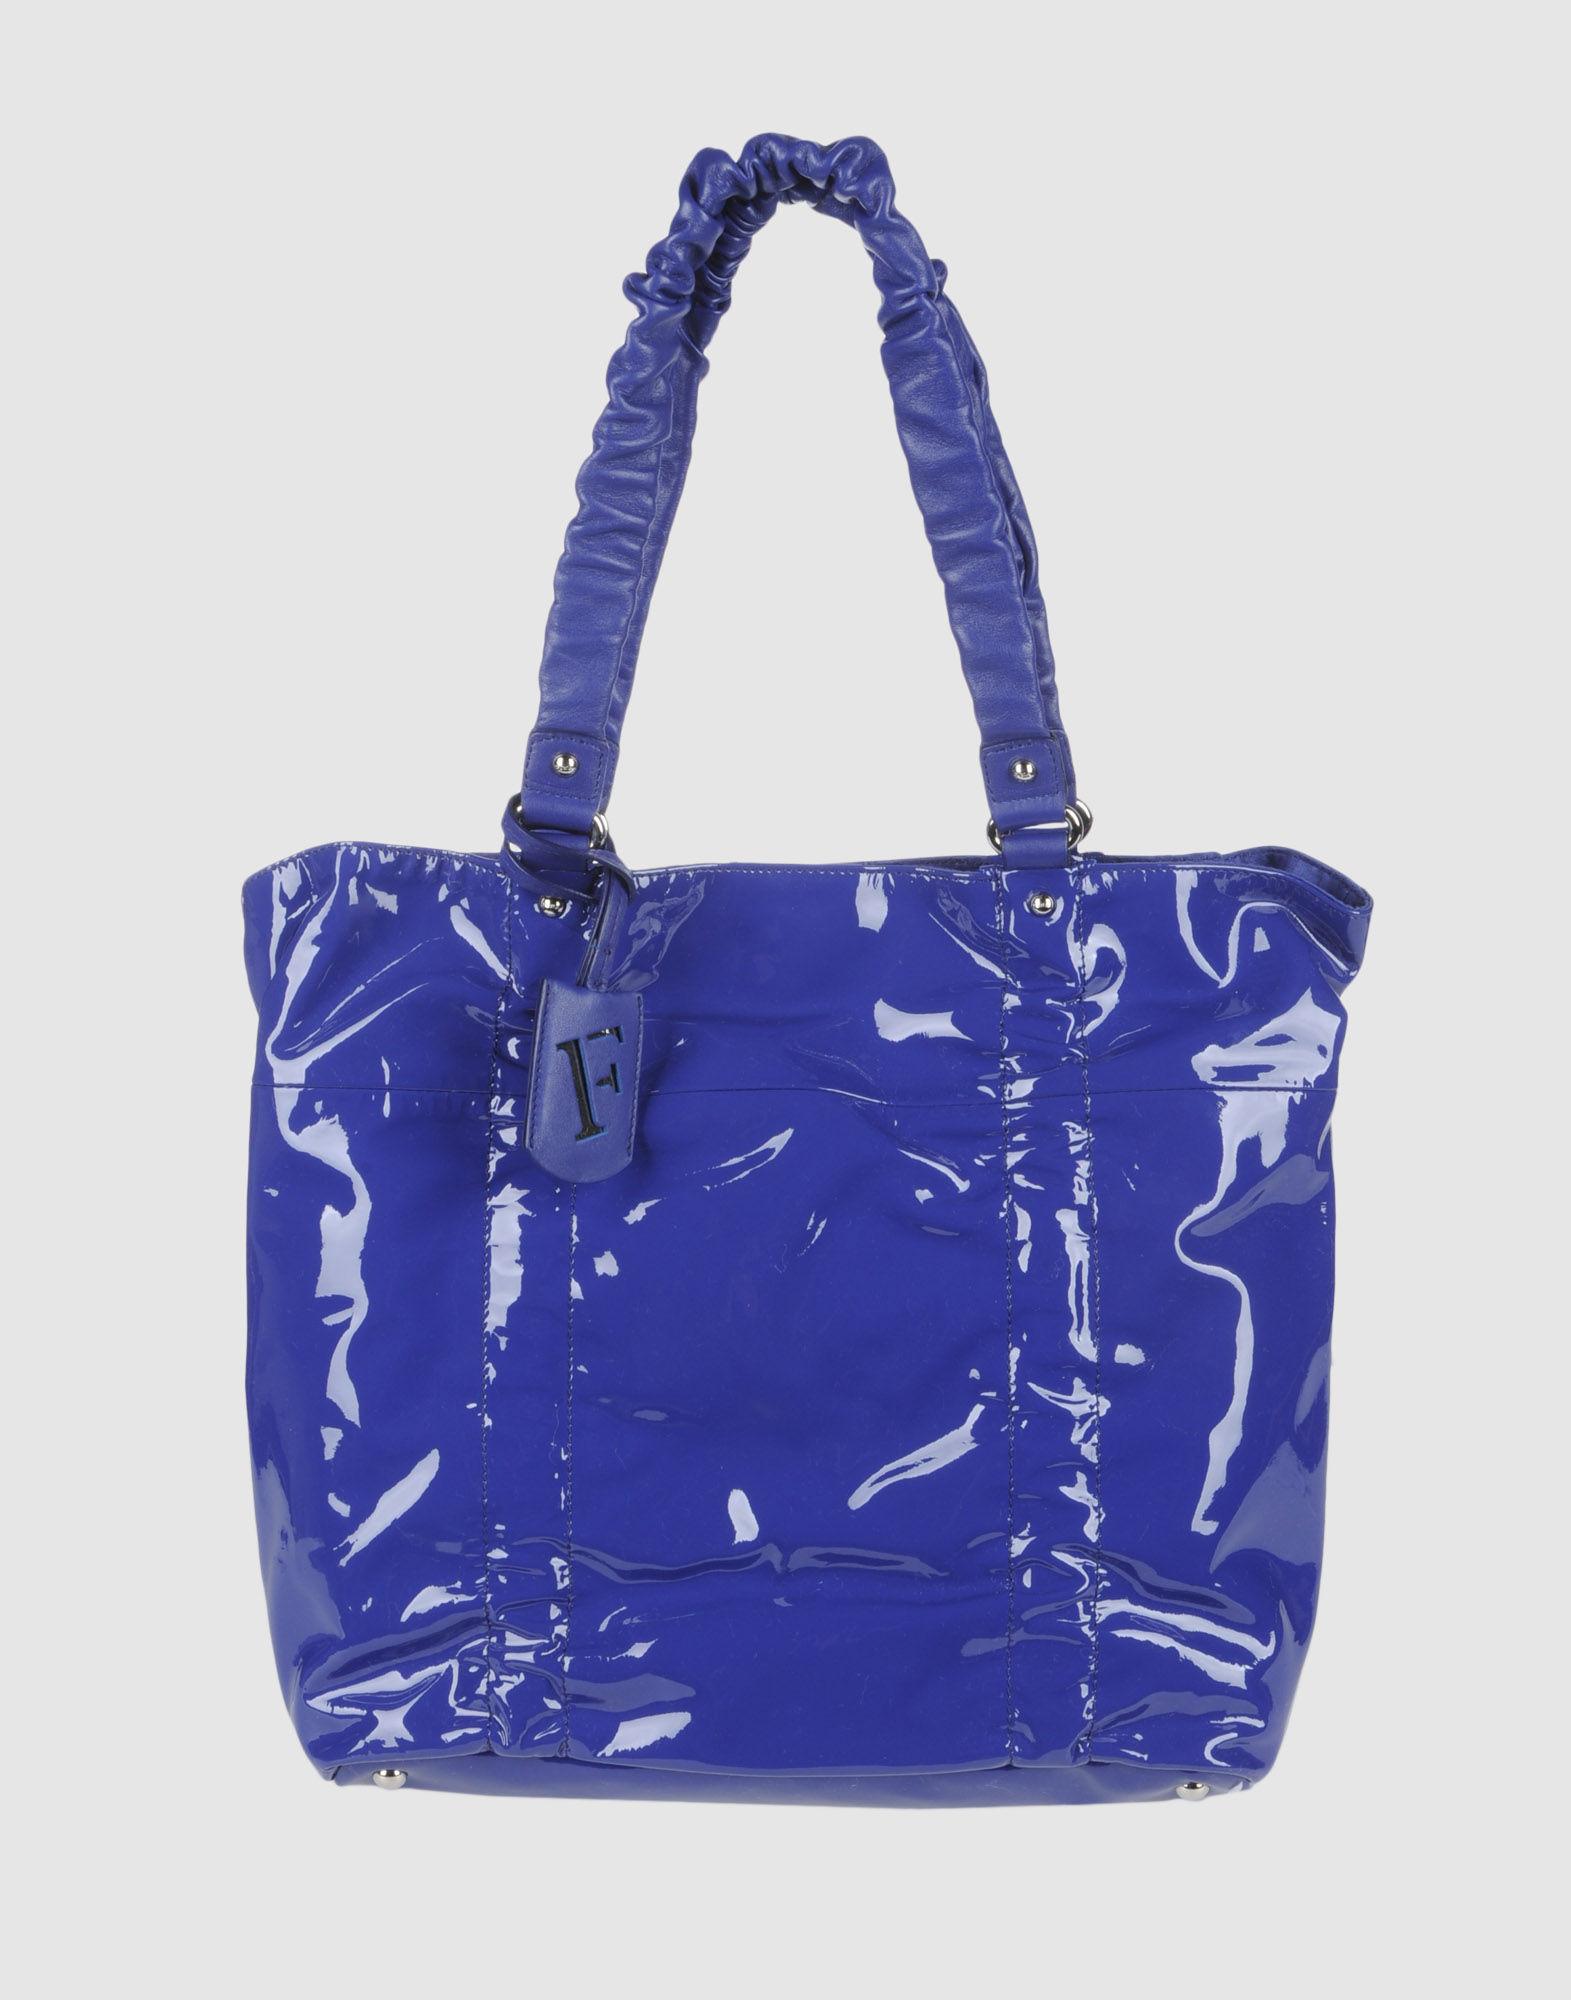 Furla Large Leather Bag in Purple